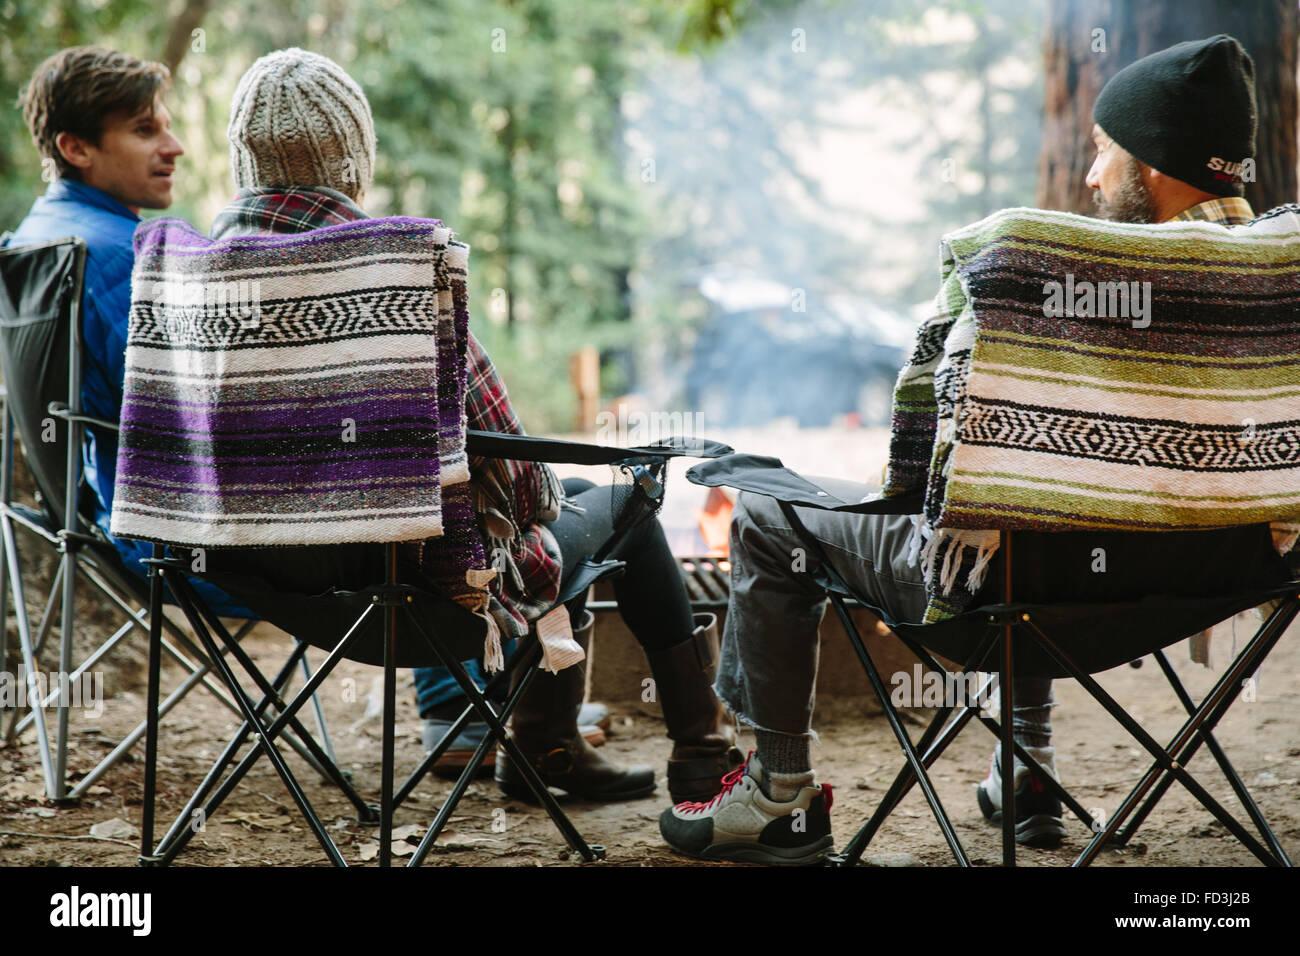 Three friends sit around a campfire in Big Sur, California. Stock Photo